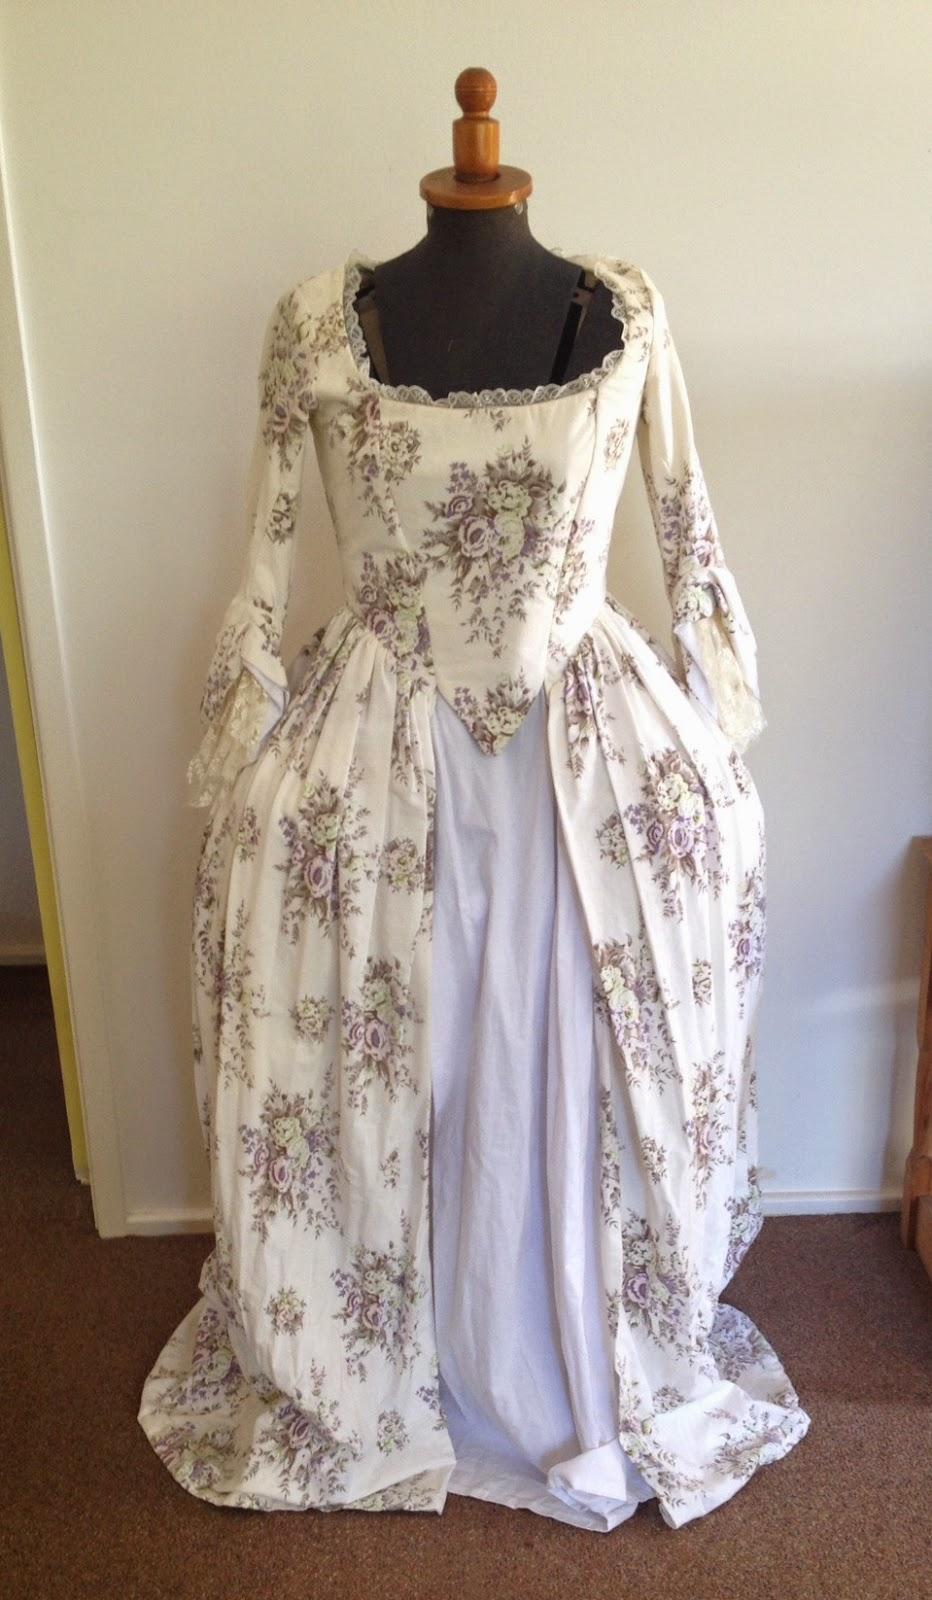 Fashioning Nostalgia: White and Floral 18th Century \'Marie ...